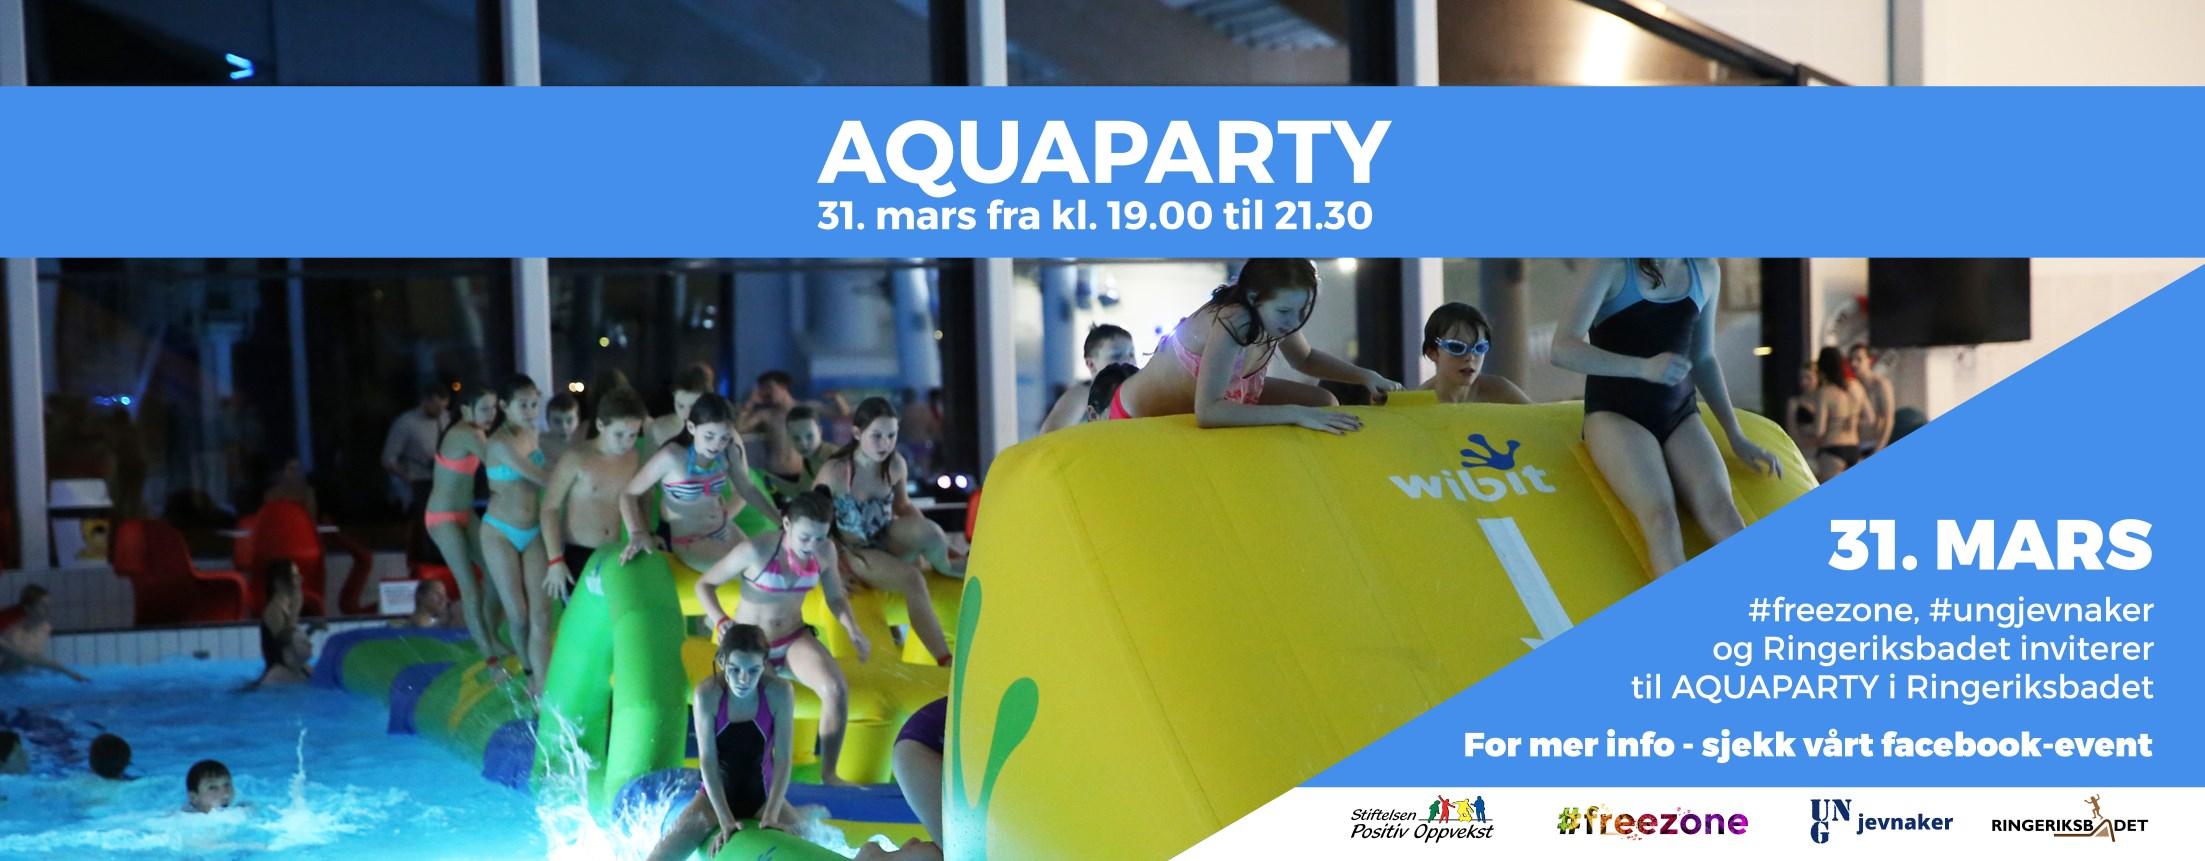 2017.03.12 1726 Aquaparty vår 2017 1280x500 utkast 01 (2205 x 861)